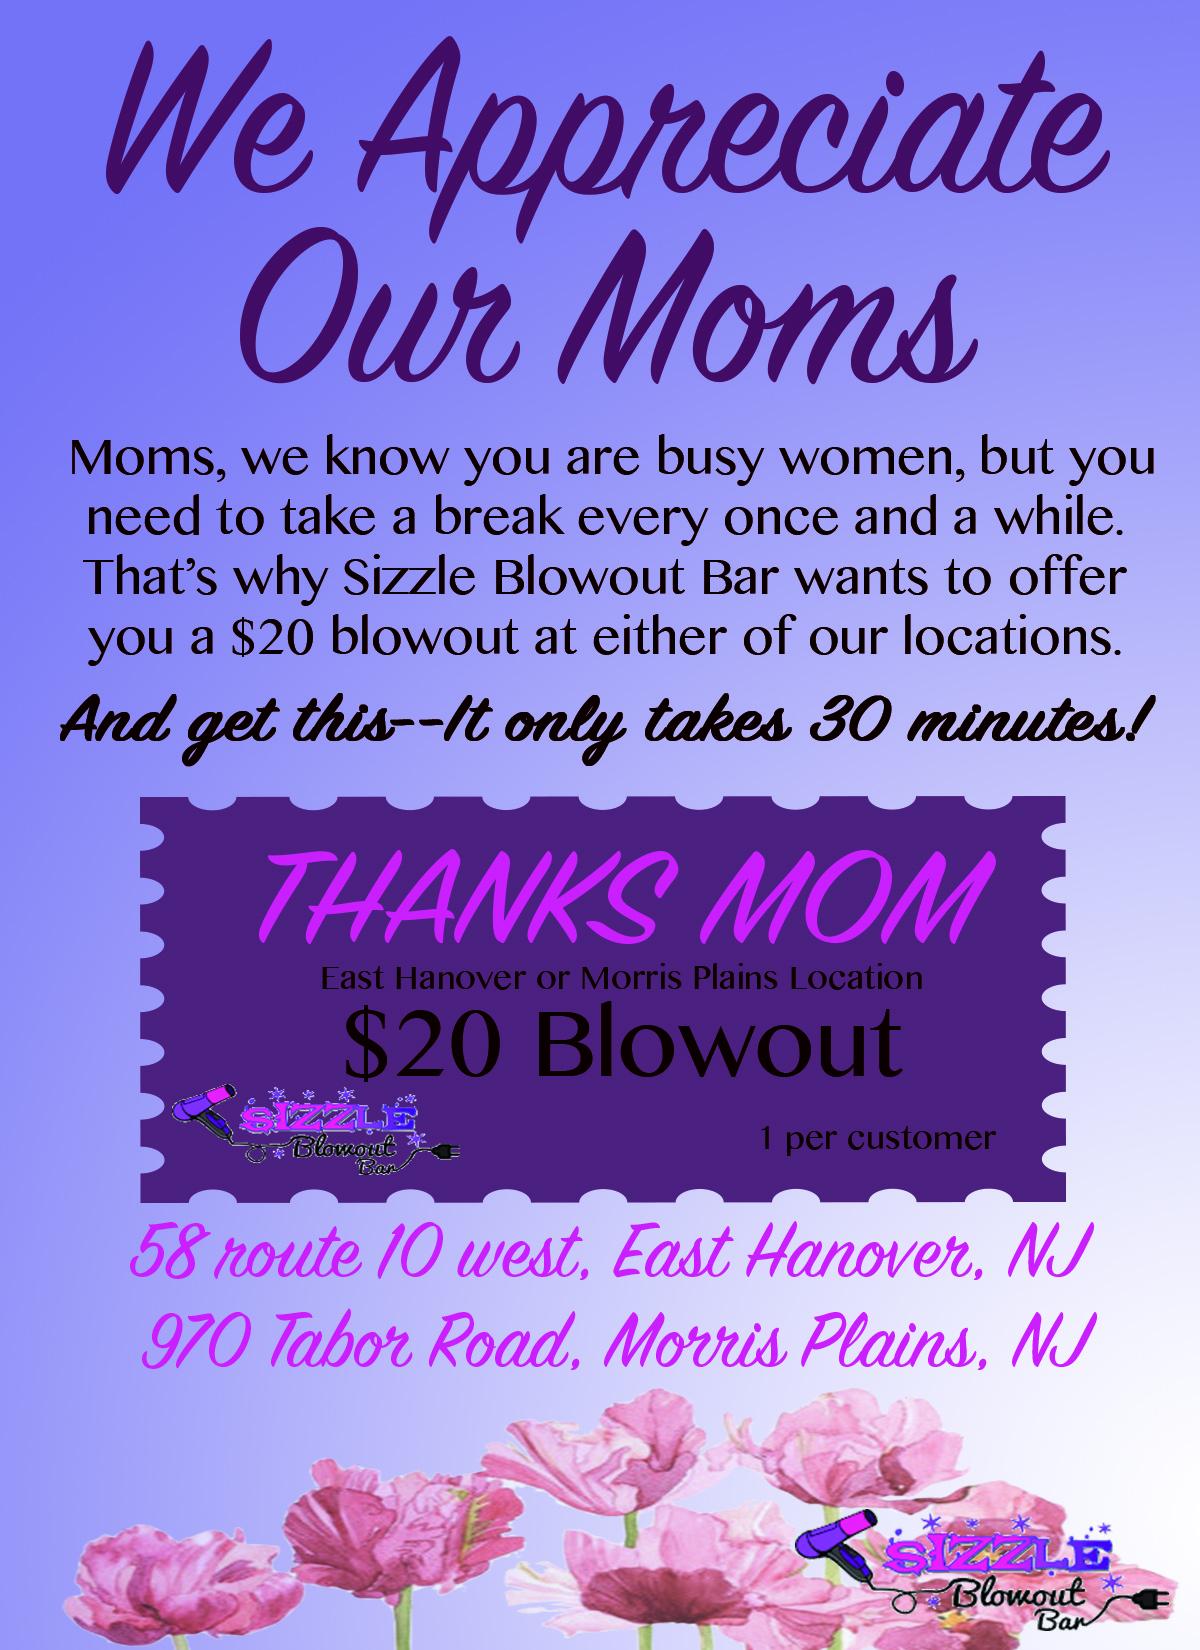 e1ecd4b41415cce97455_mom-blowout-flyer_copy__1_.jpg